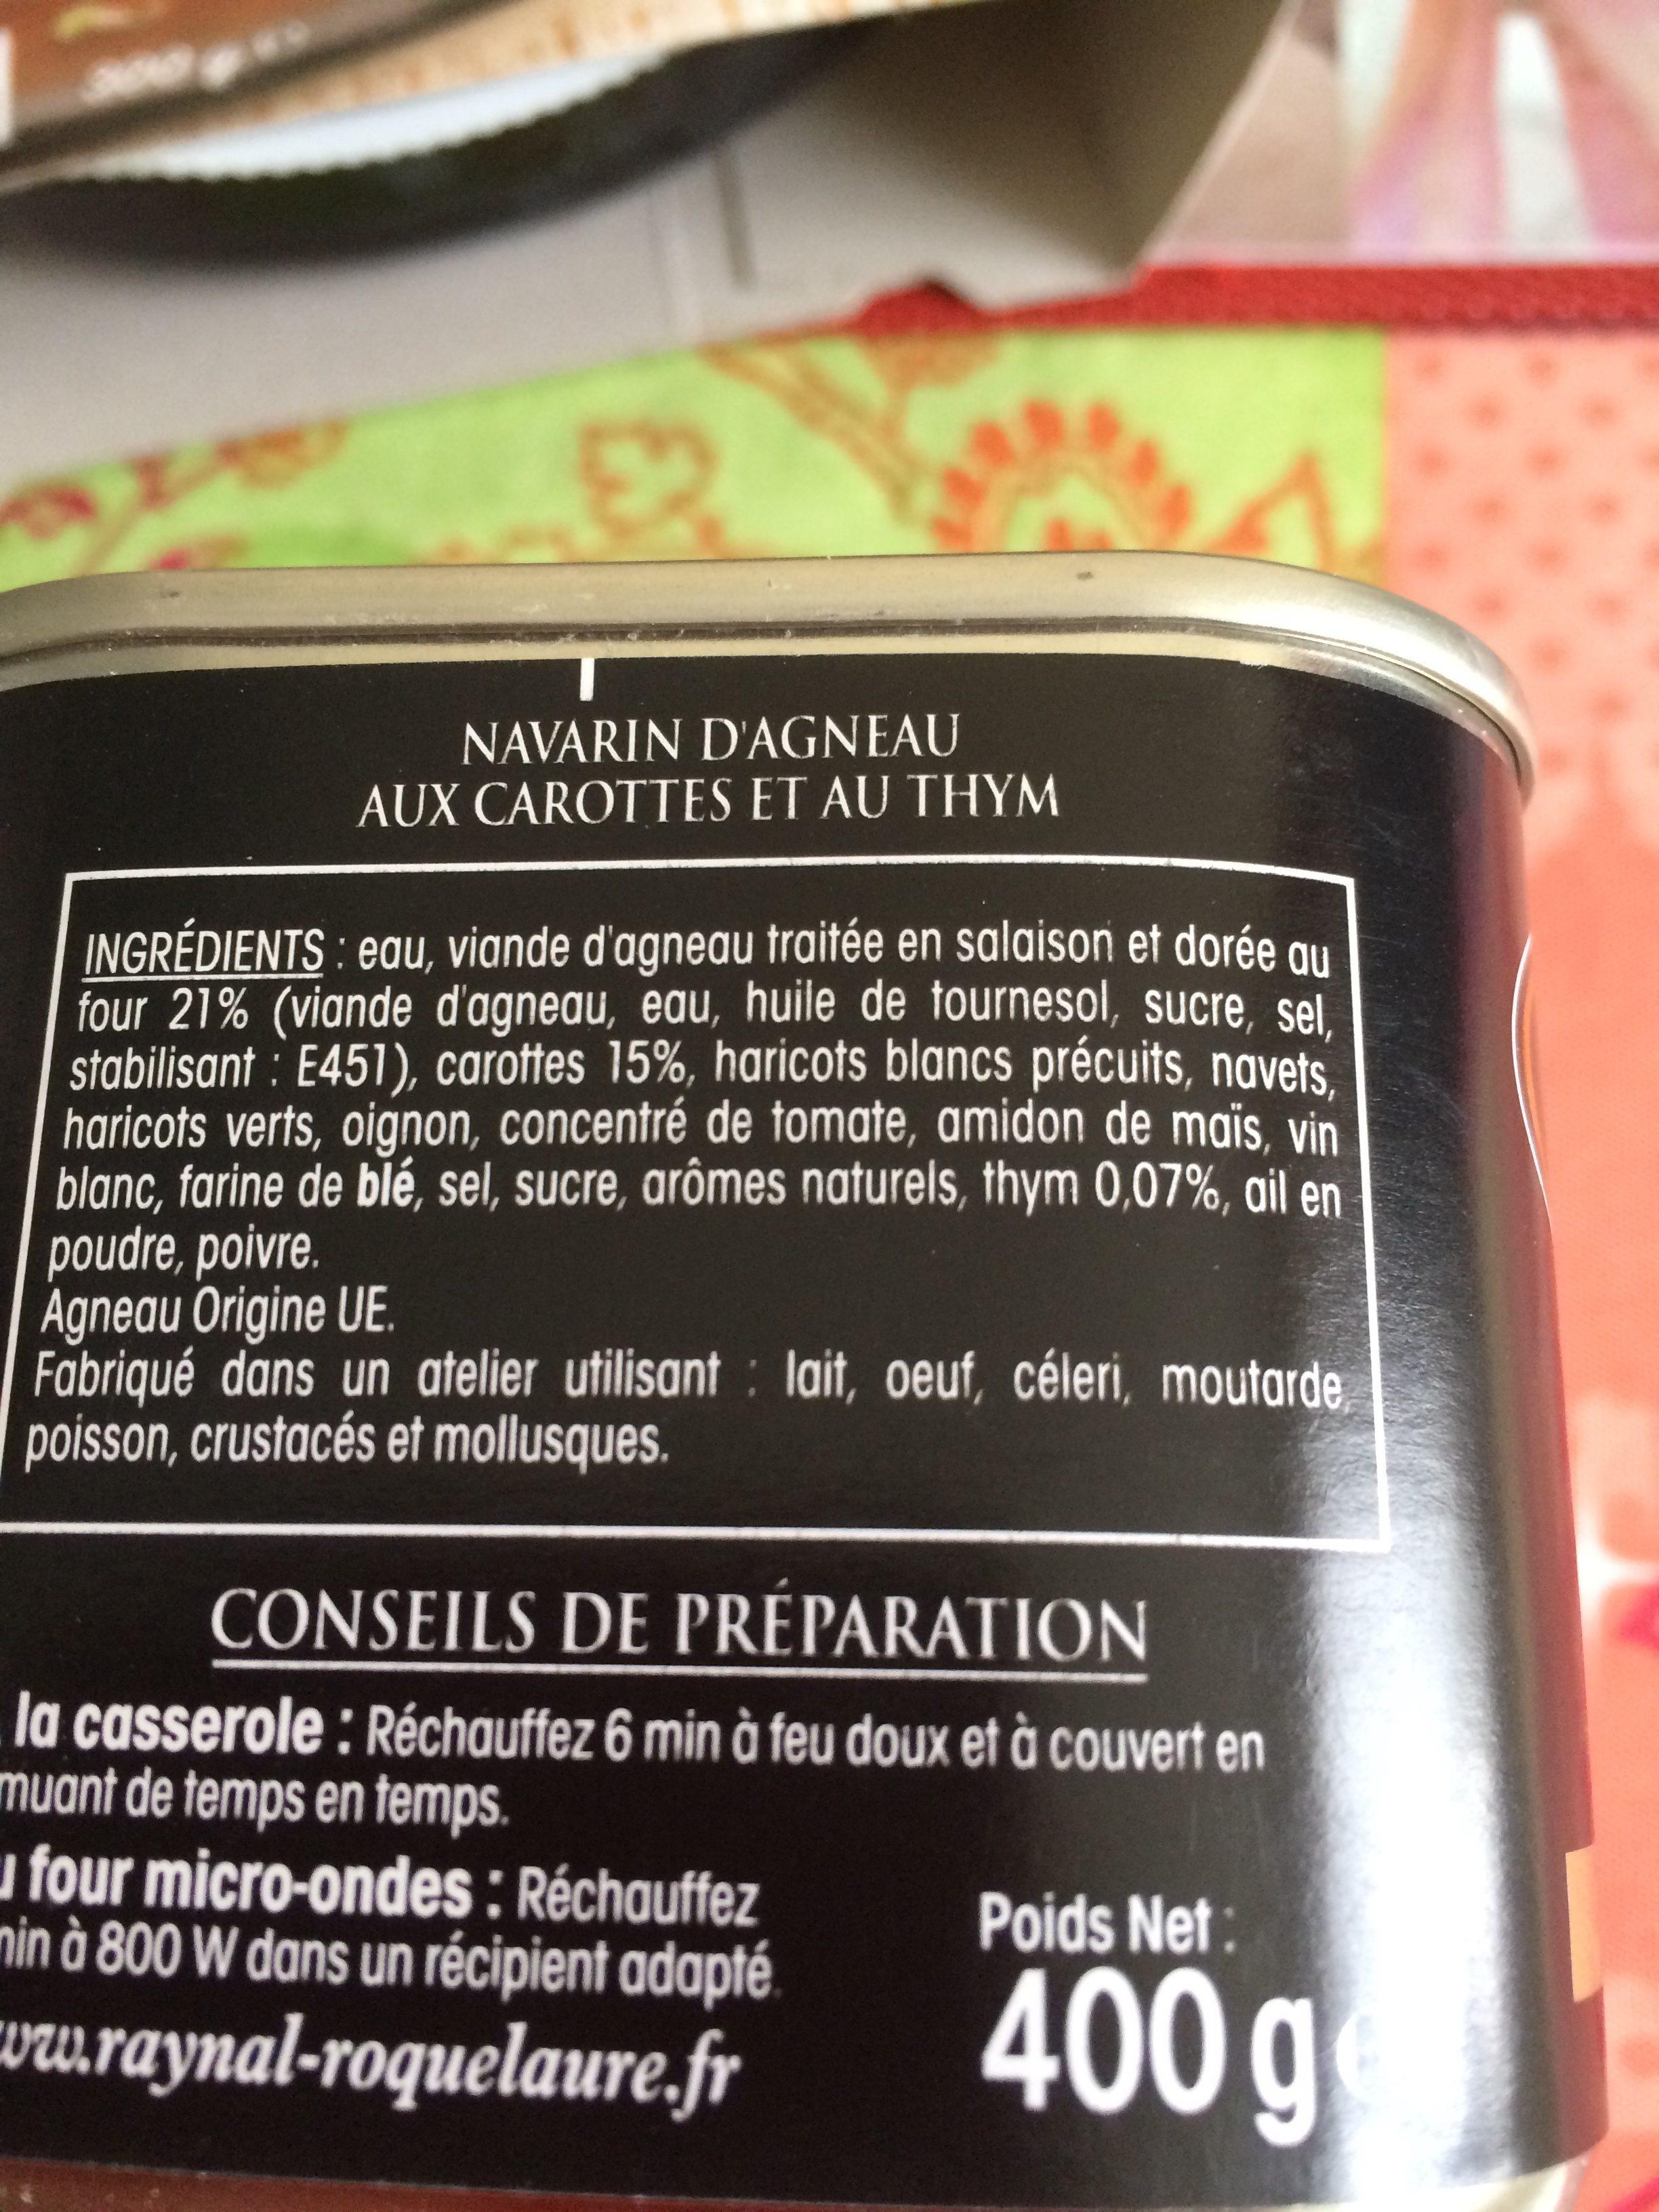 Navarin d'agneau - Ingredients - fr